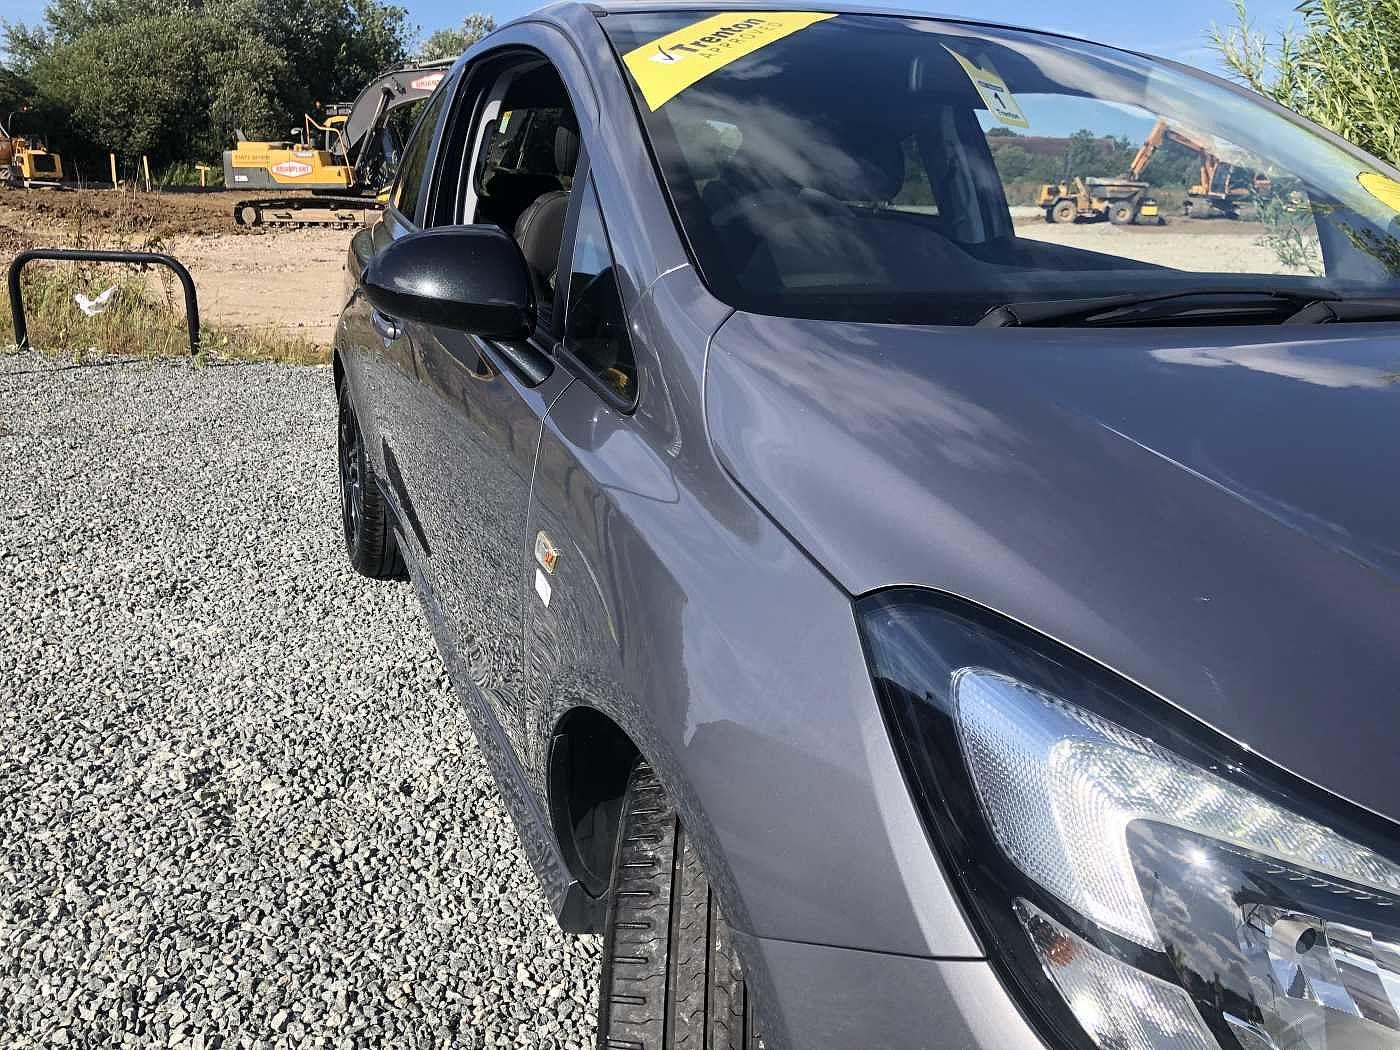 Vauxhall Corsa 1.4i (90ps) Limited Edition 3-Dr Hatchback